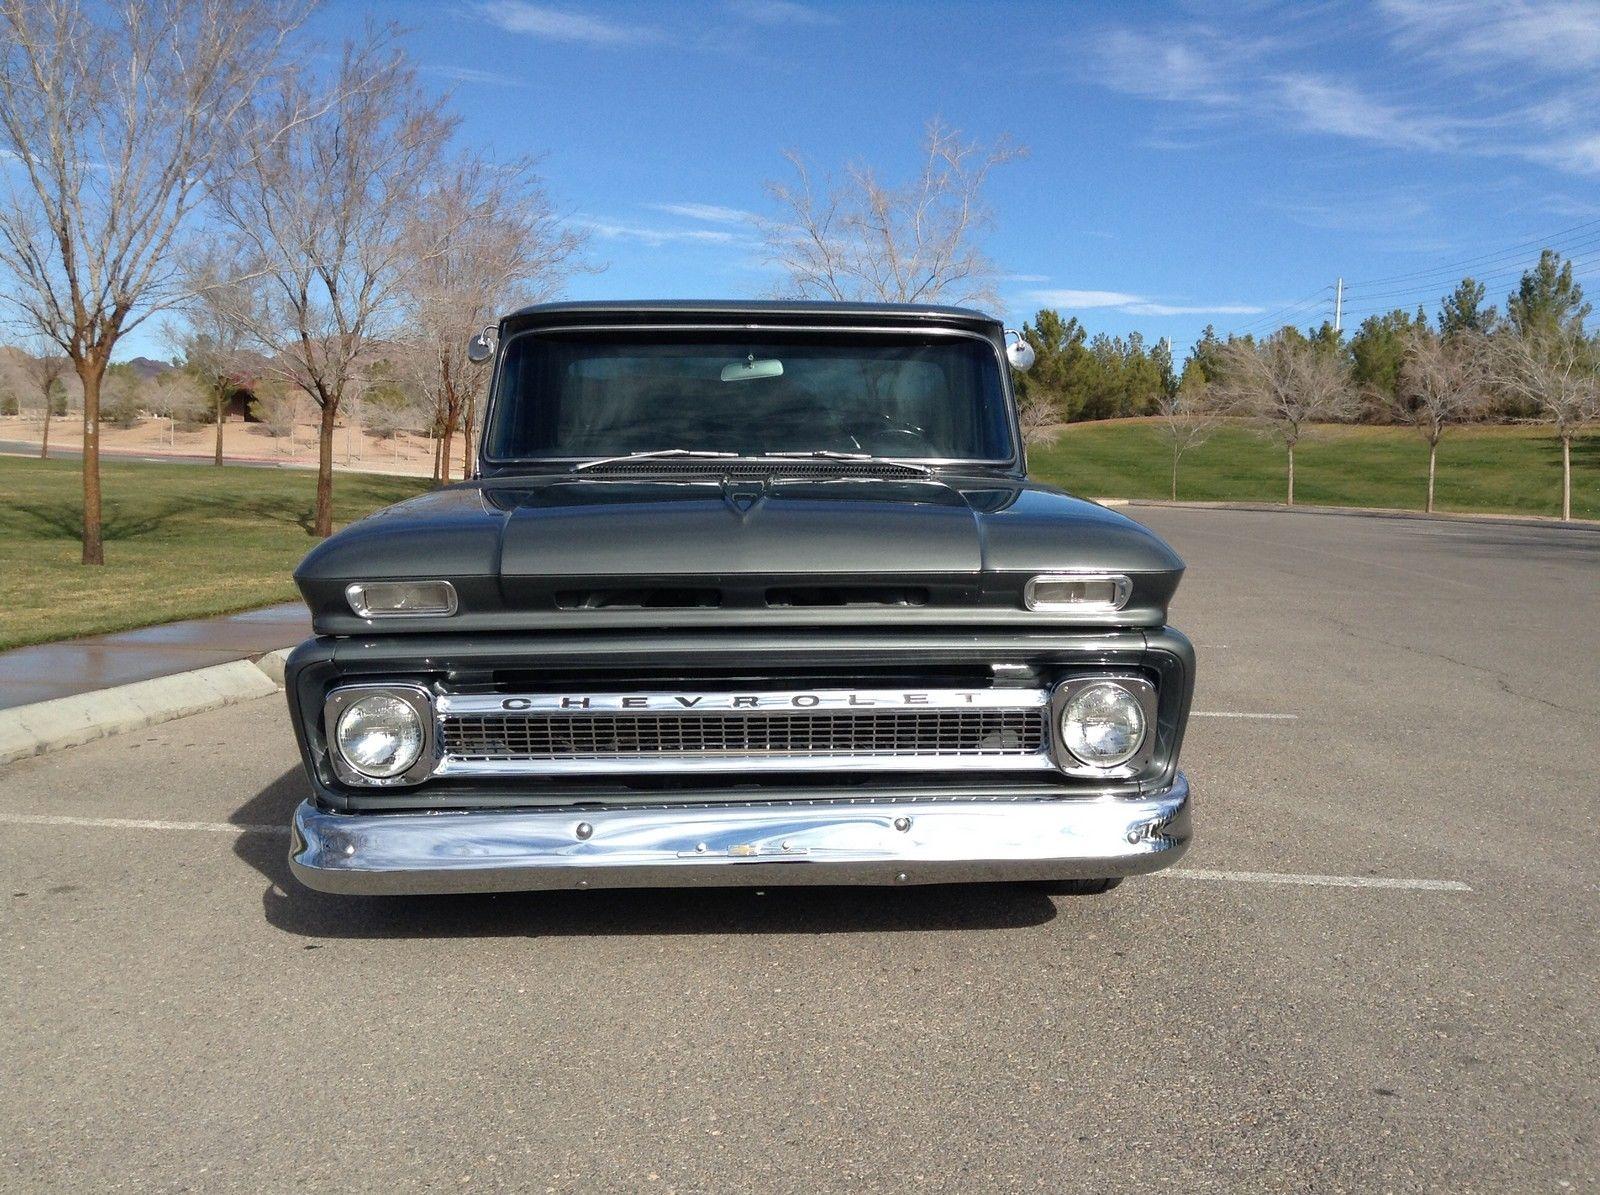 1964 Chevrolet C 10 Custom Cab Short Bed Big Window Pickup For Sale Chevy Truck Inner Fender In Boulder City Nevada United States